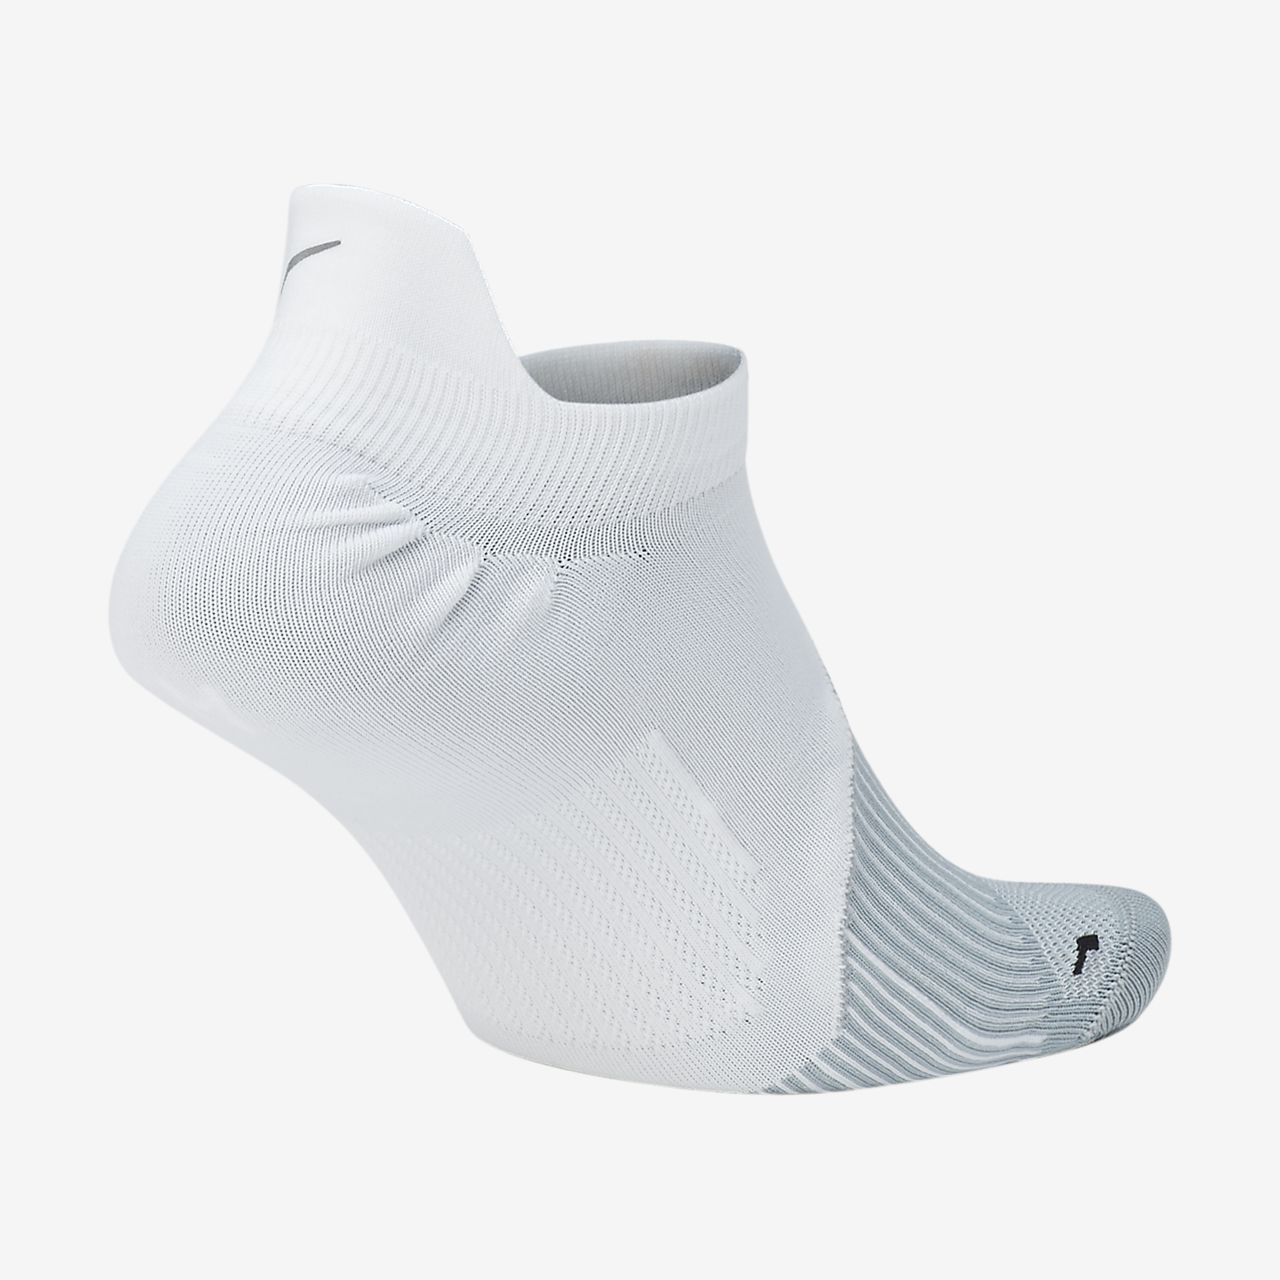 Löparstrumpor Nike Elite Lightweight No-Show